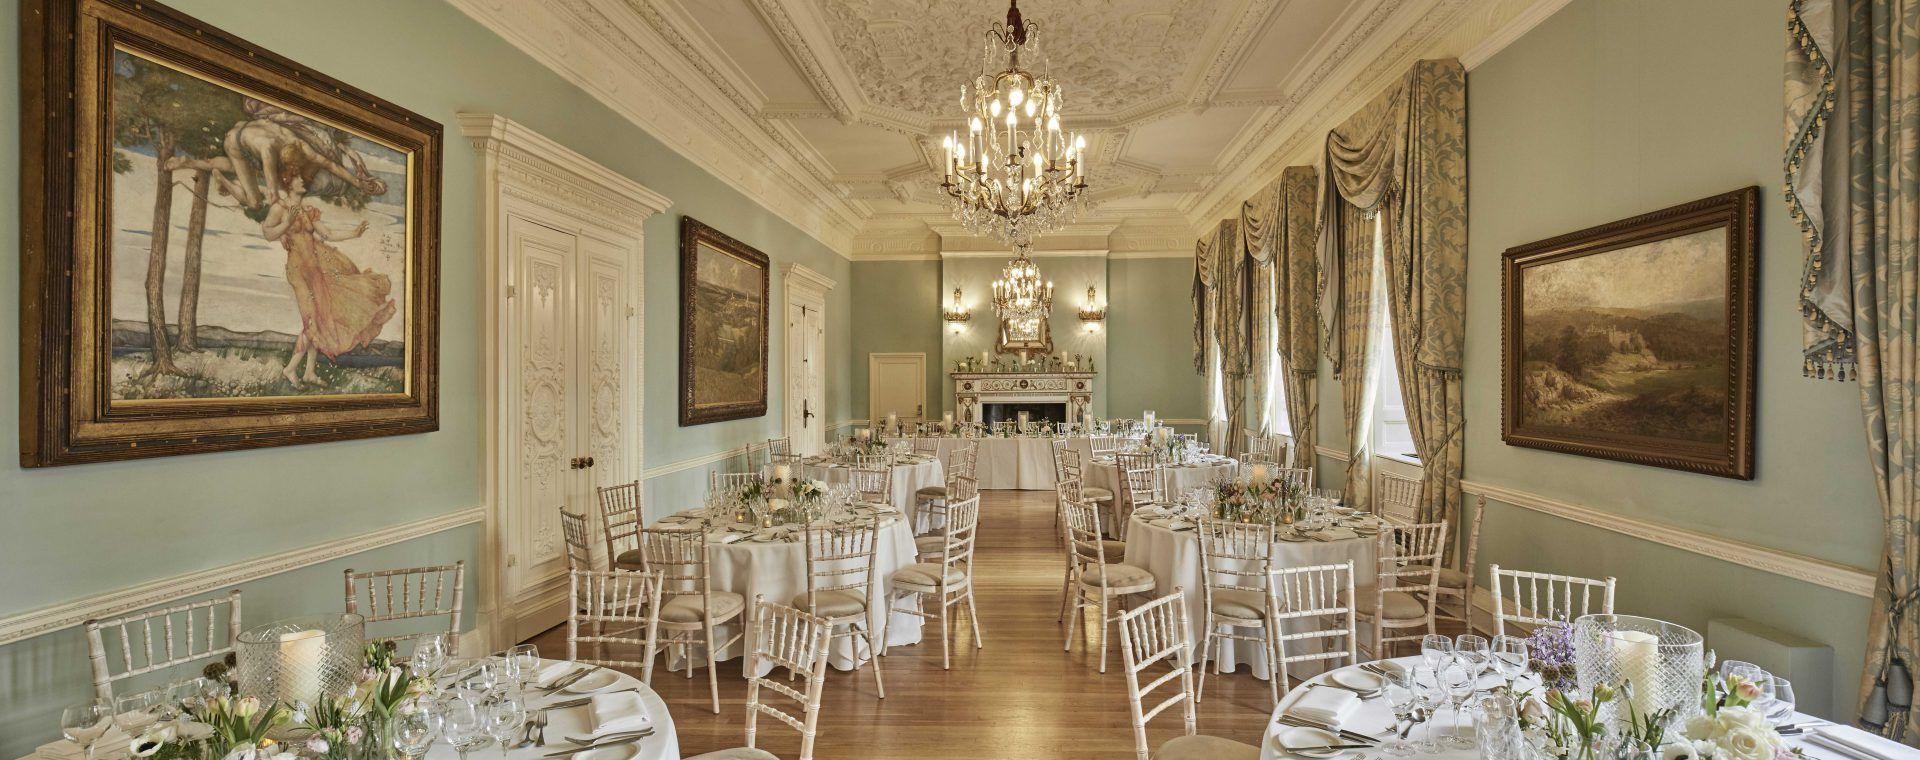 dartmouth house weddings london wedding venues in London